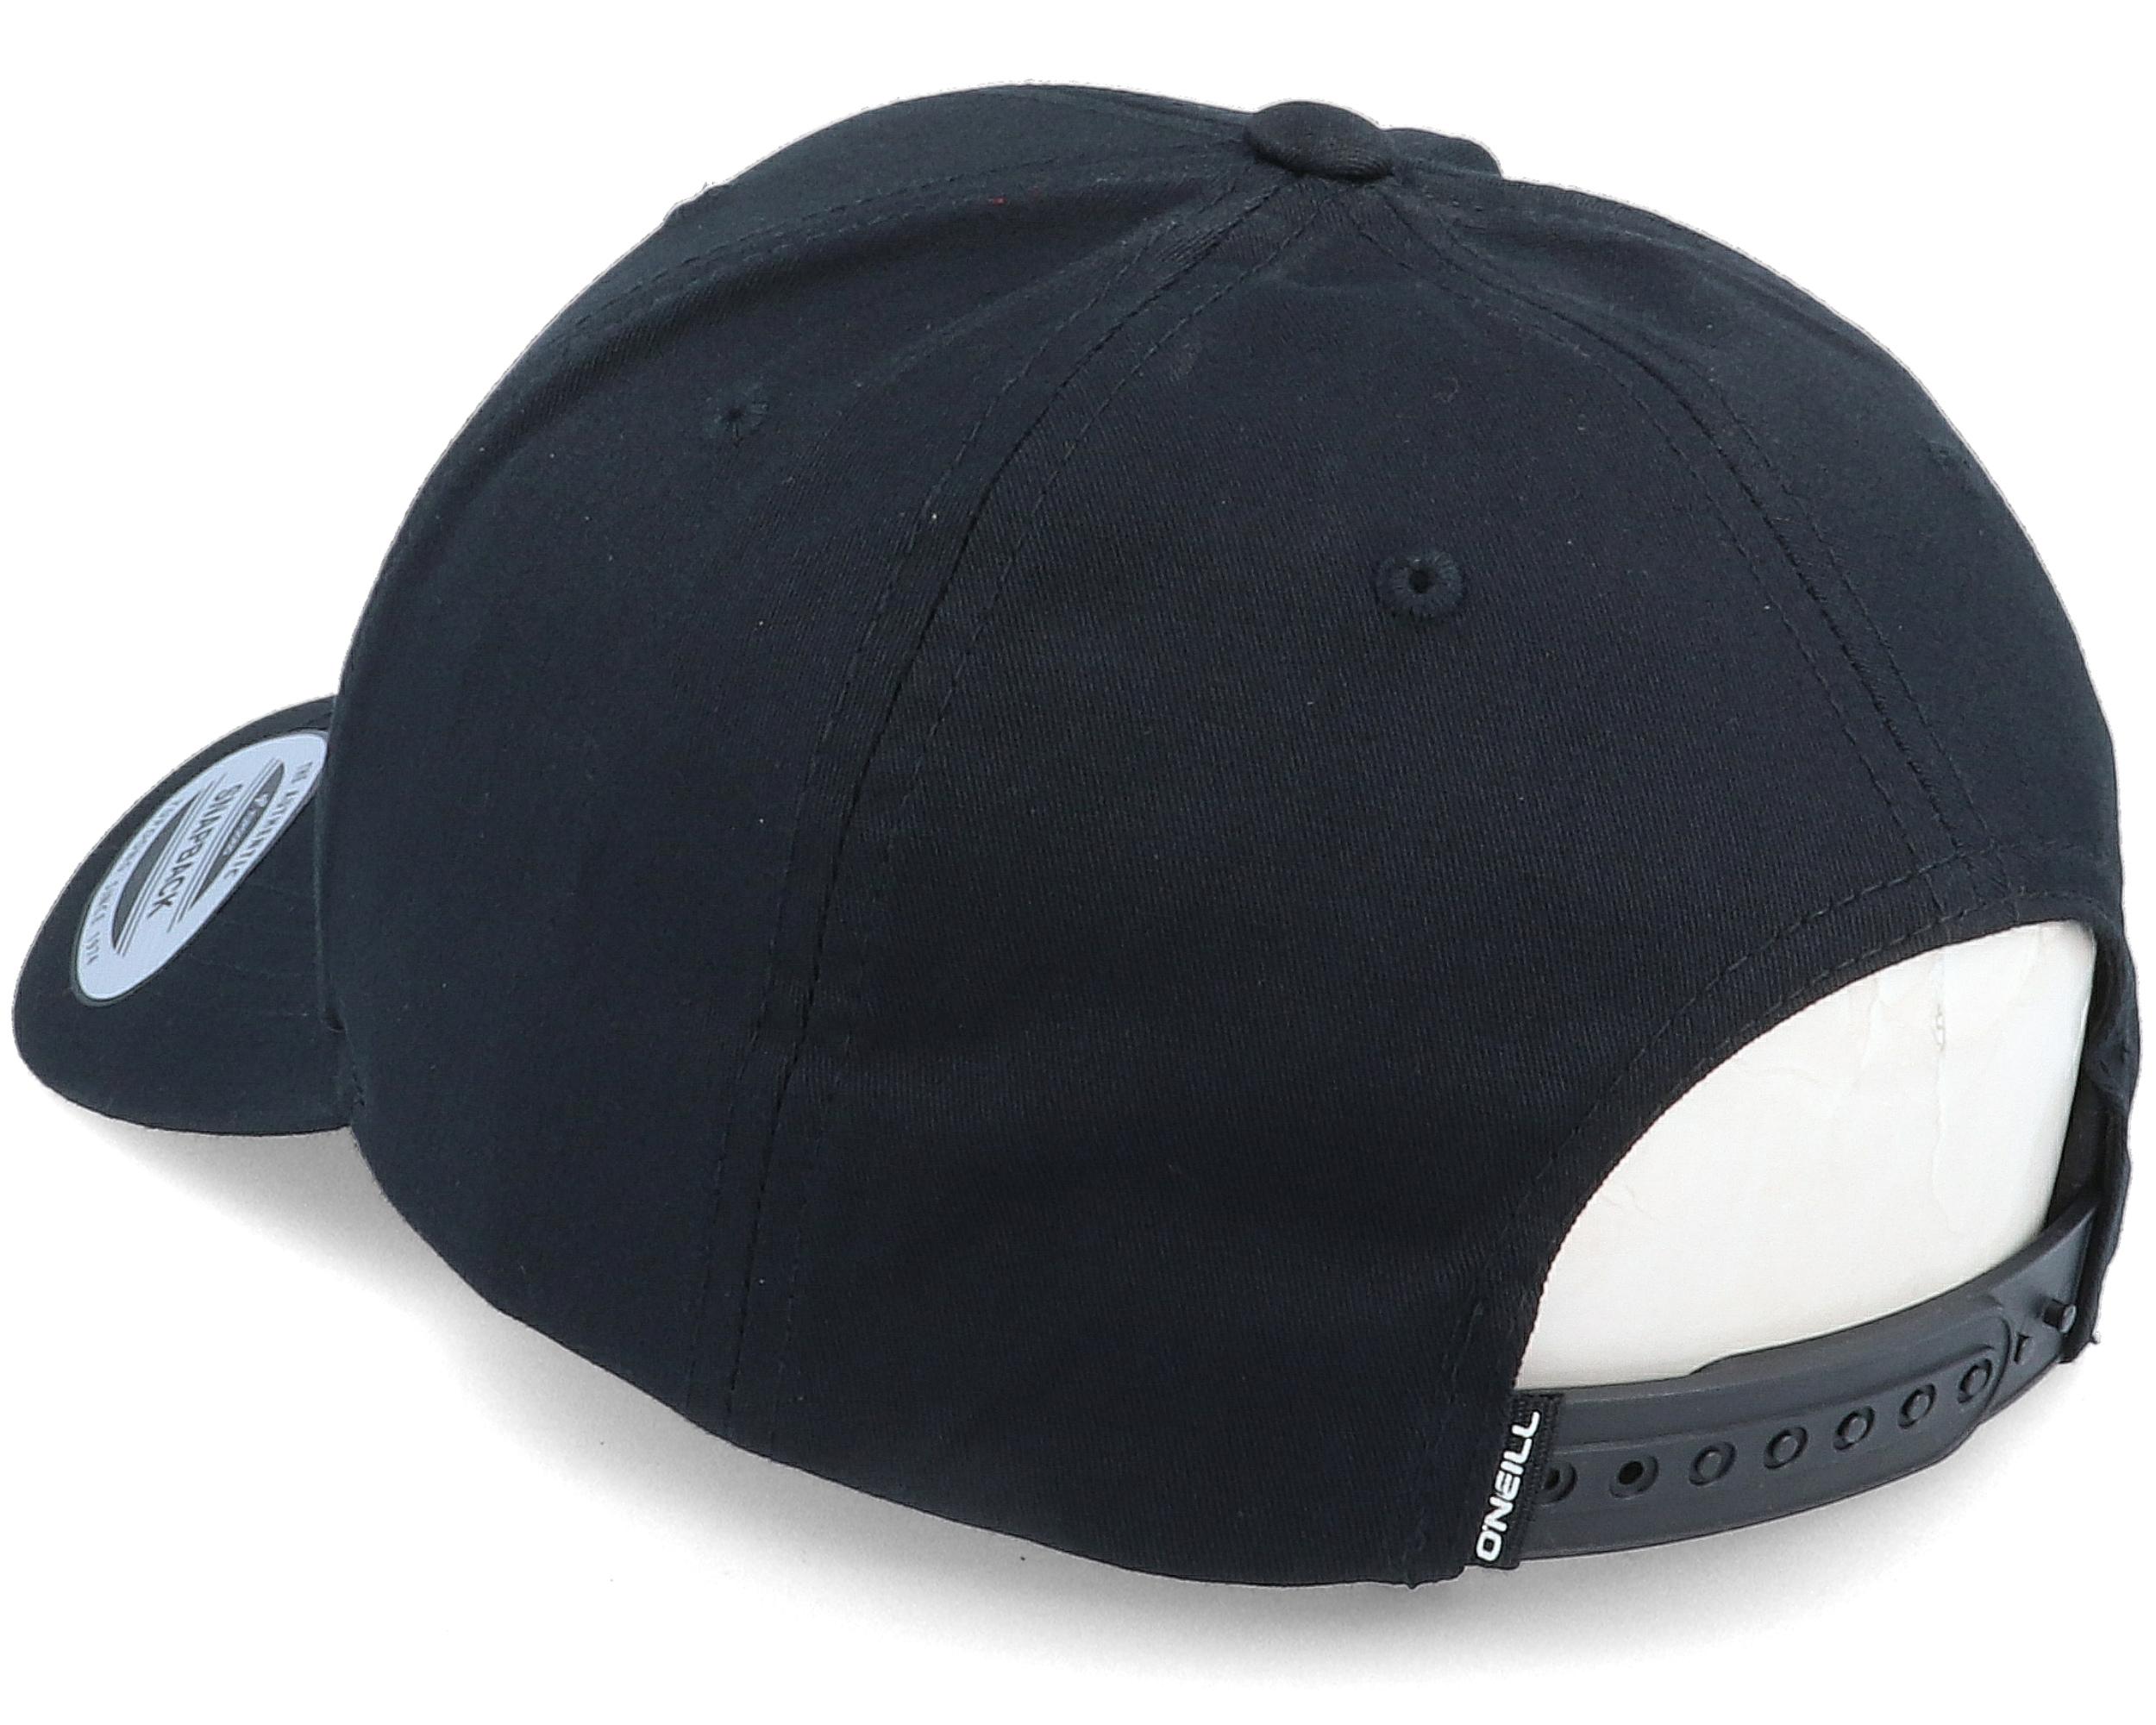 Bm Cross Side Black 110 Adjustable - Bearded Man caps